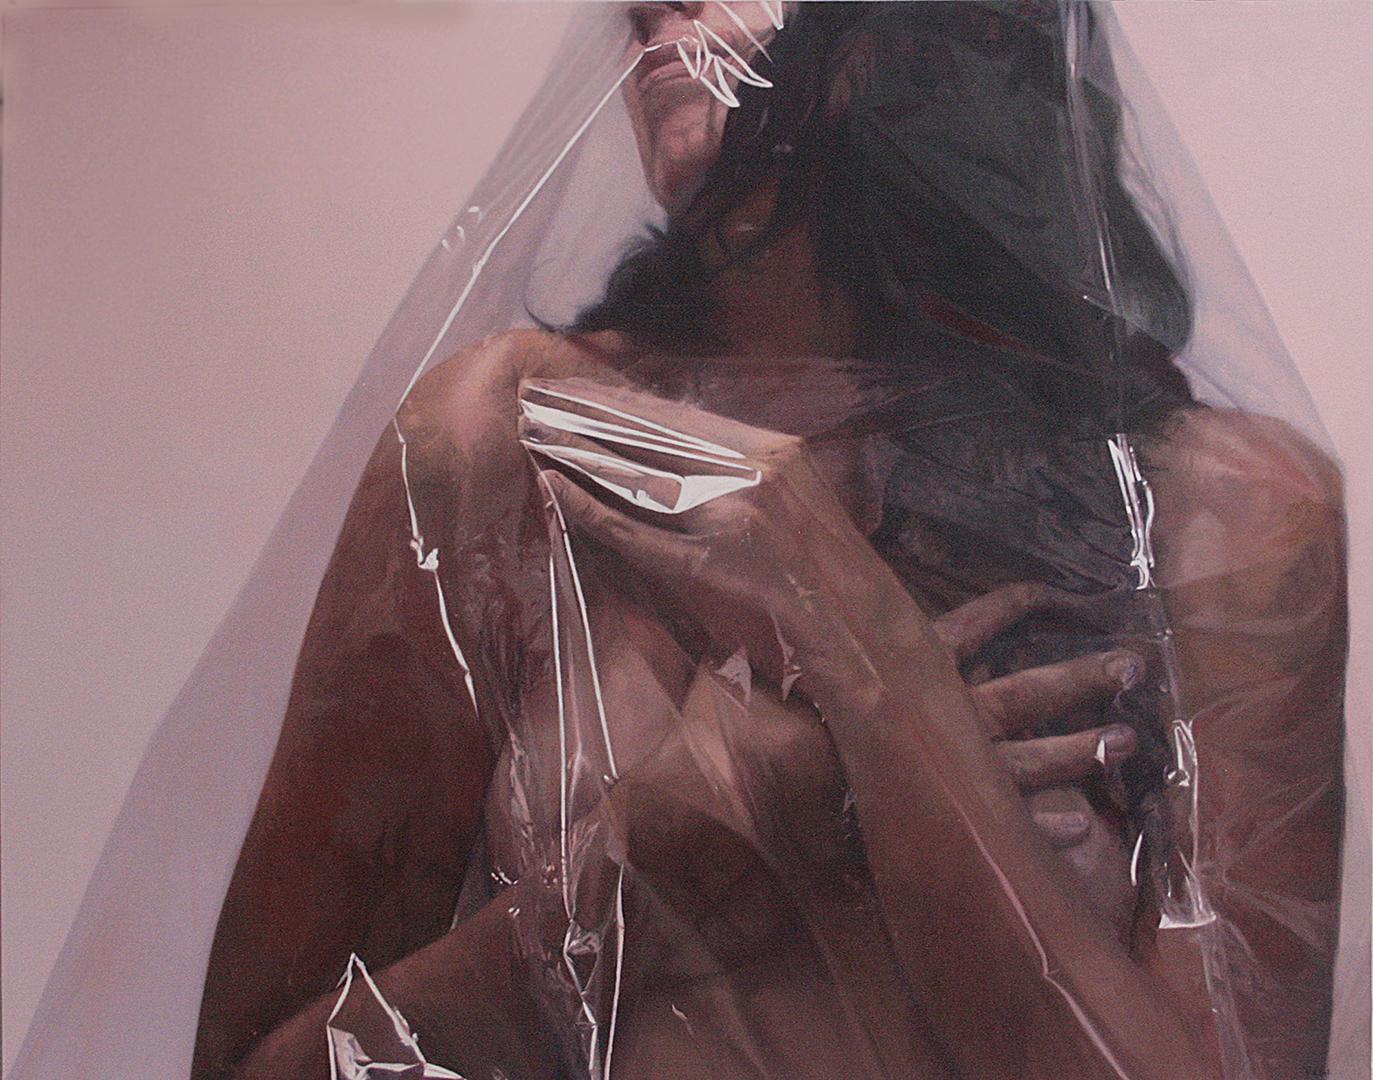 Blindaje Espiritual 3 · Óleo sobre lienzo · 150cm X 120cm · 2015